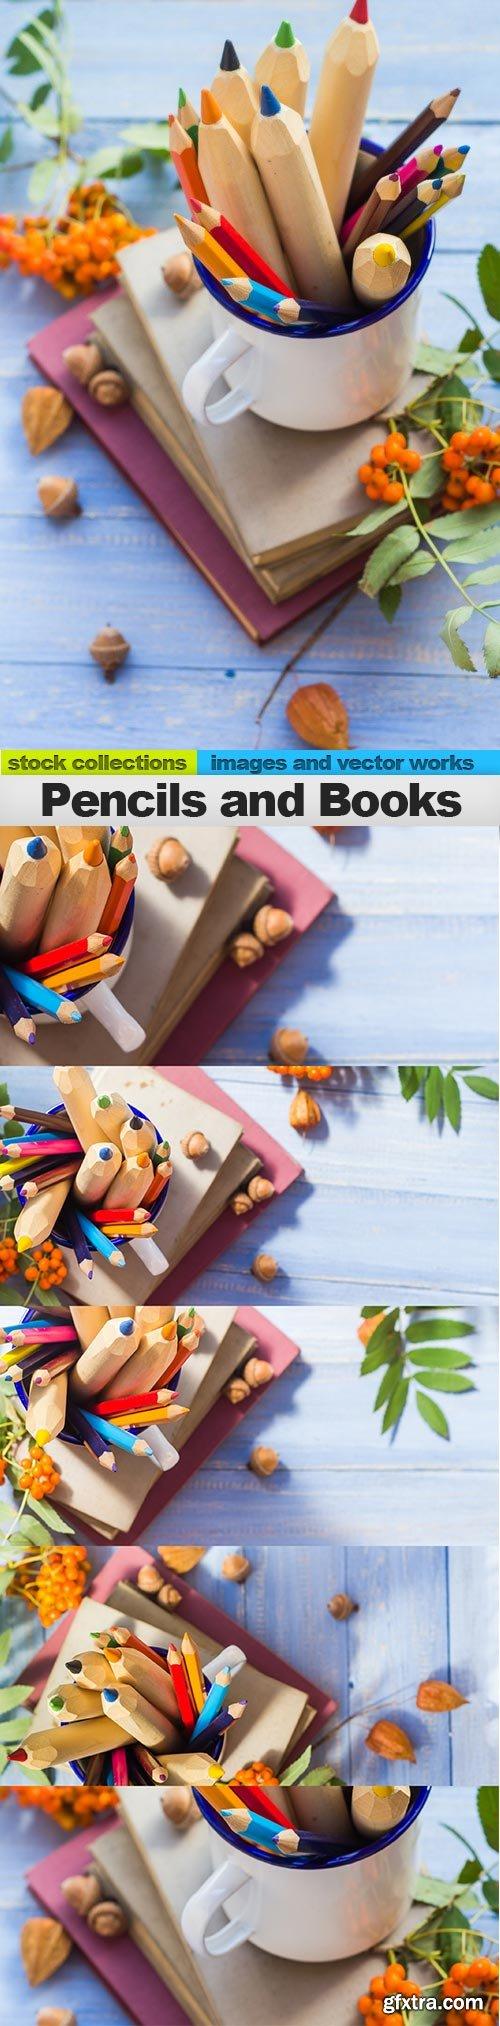 Pencils and Books, 05 x UHQ JPEG